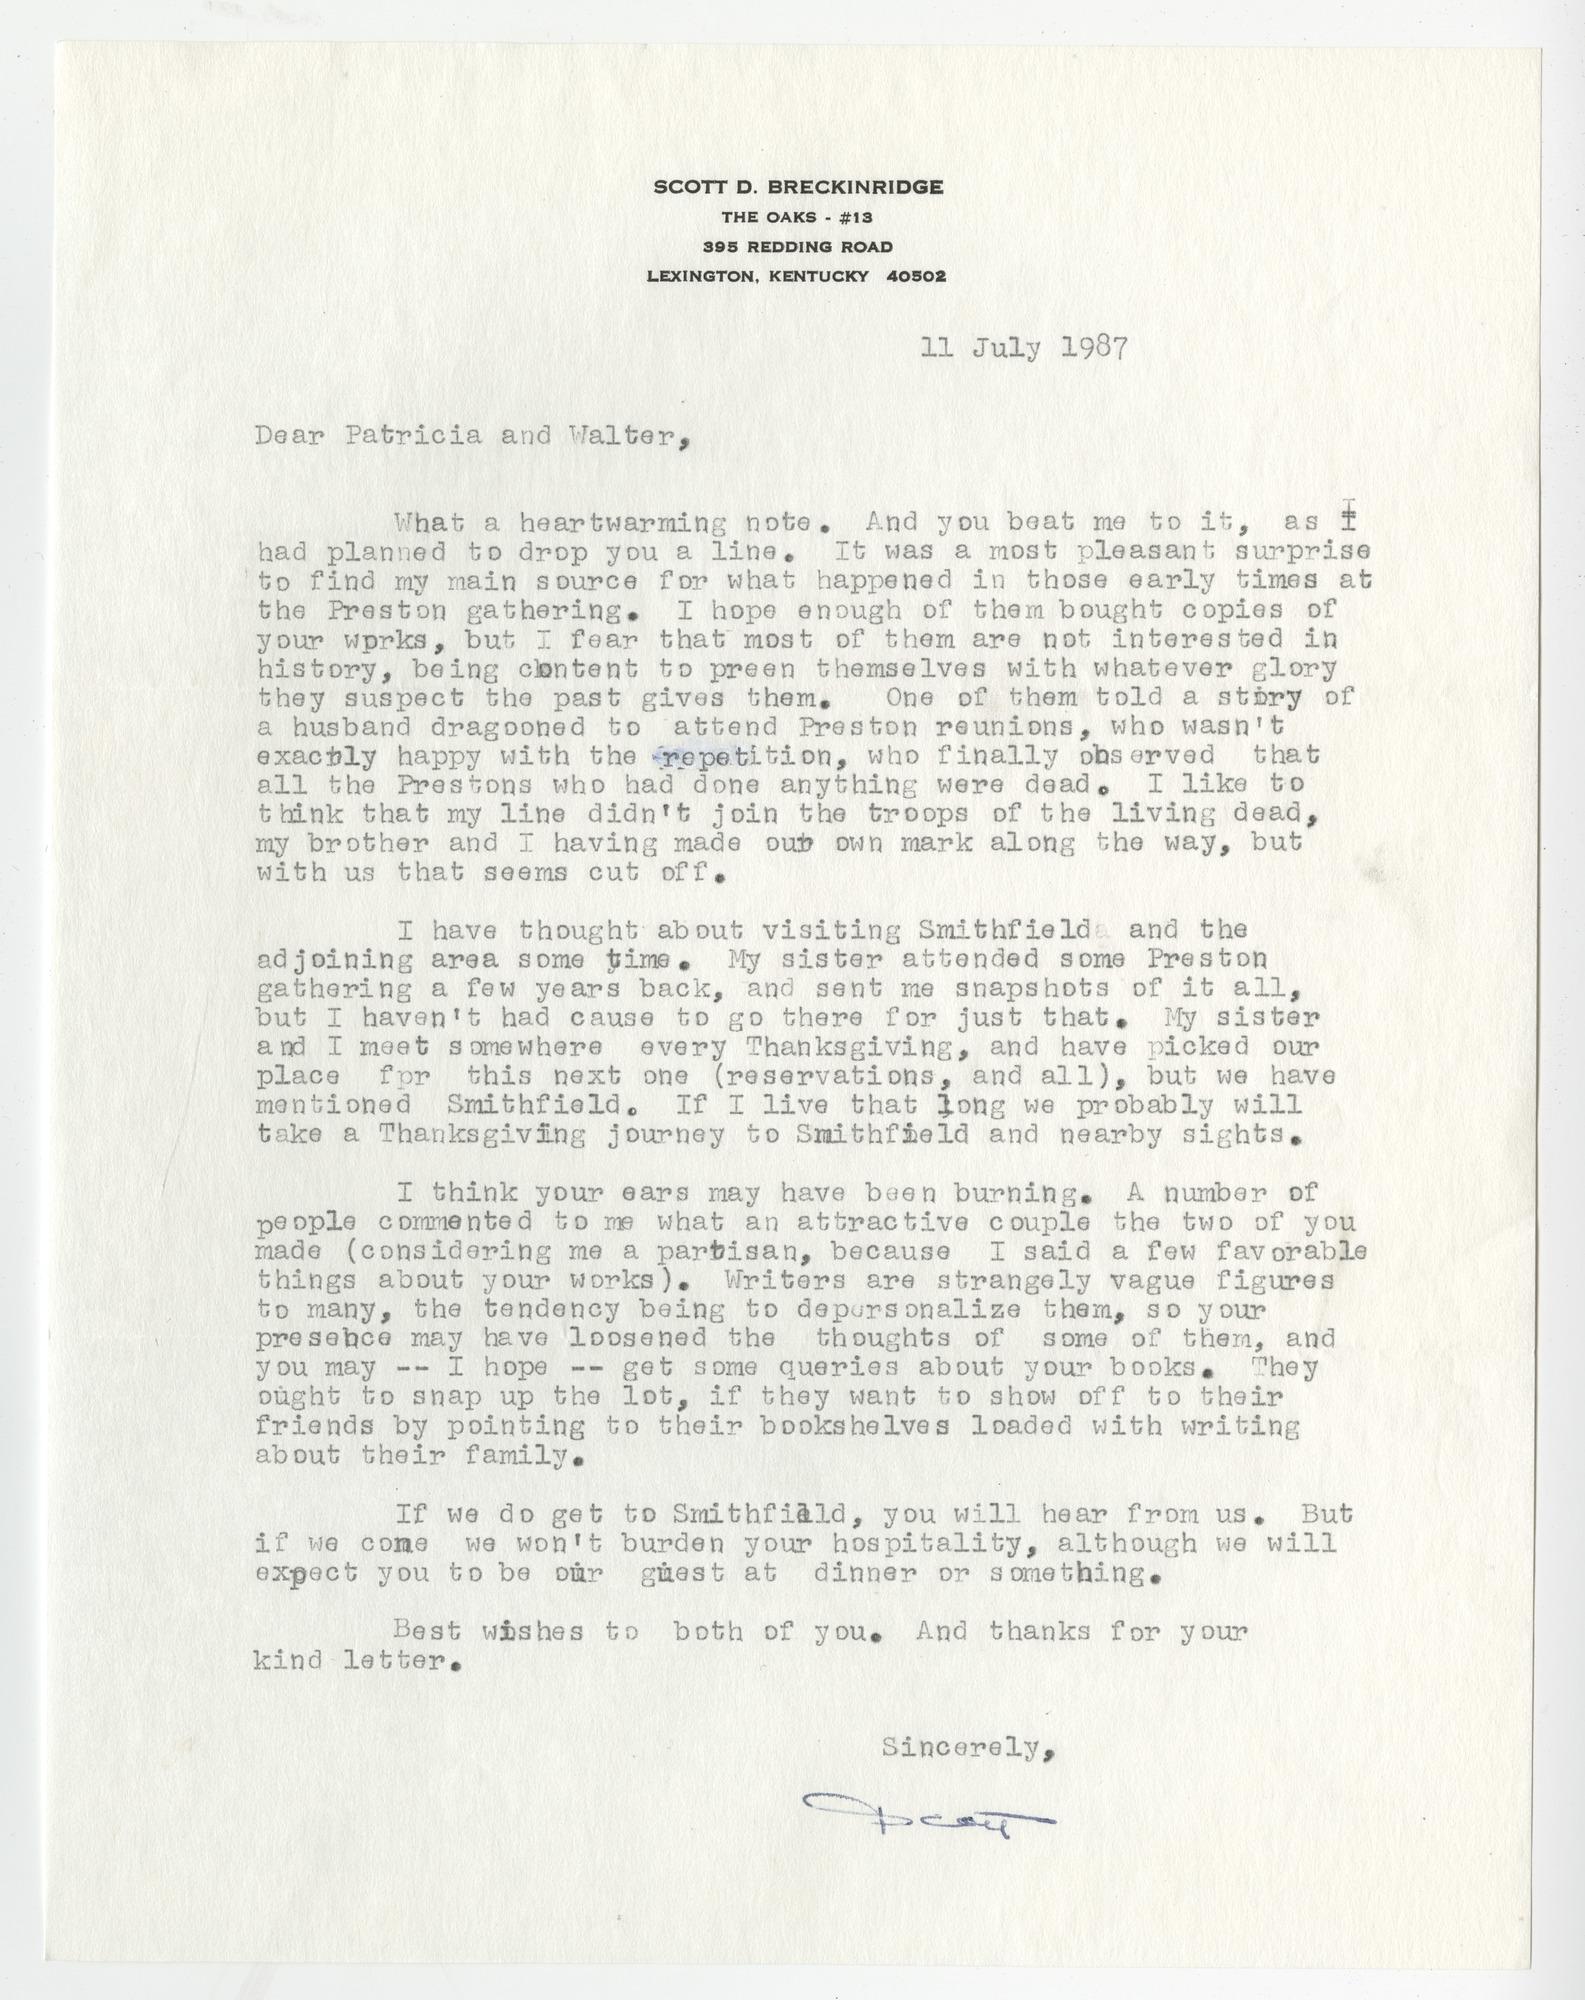 Ms1988-007_JohnsonPatriciaGivens_B1F1_Correspondence_1987_0711.jpg